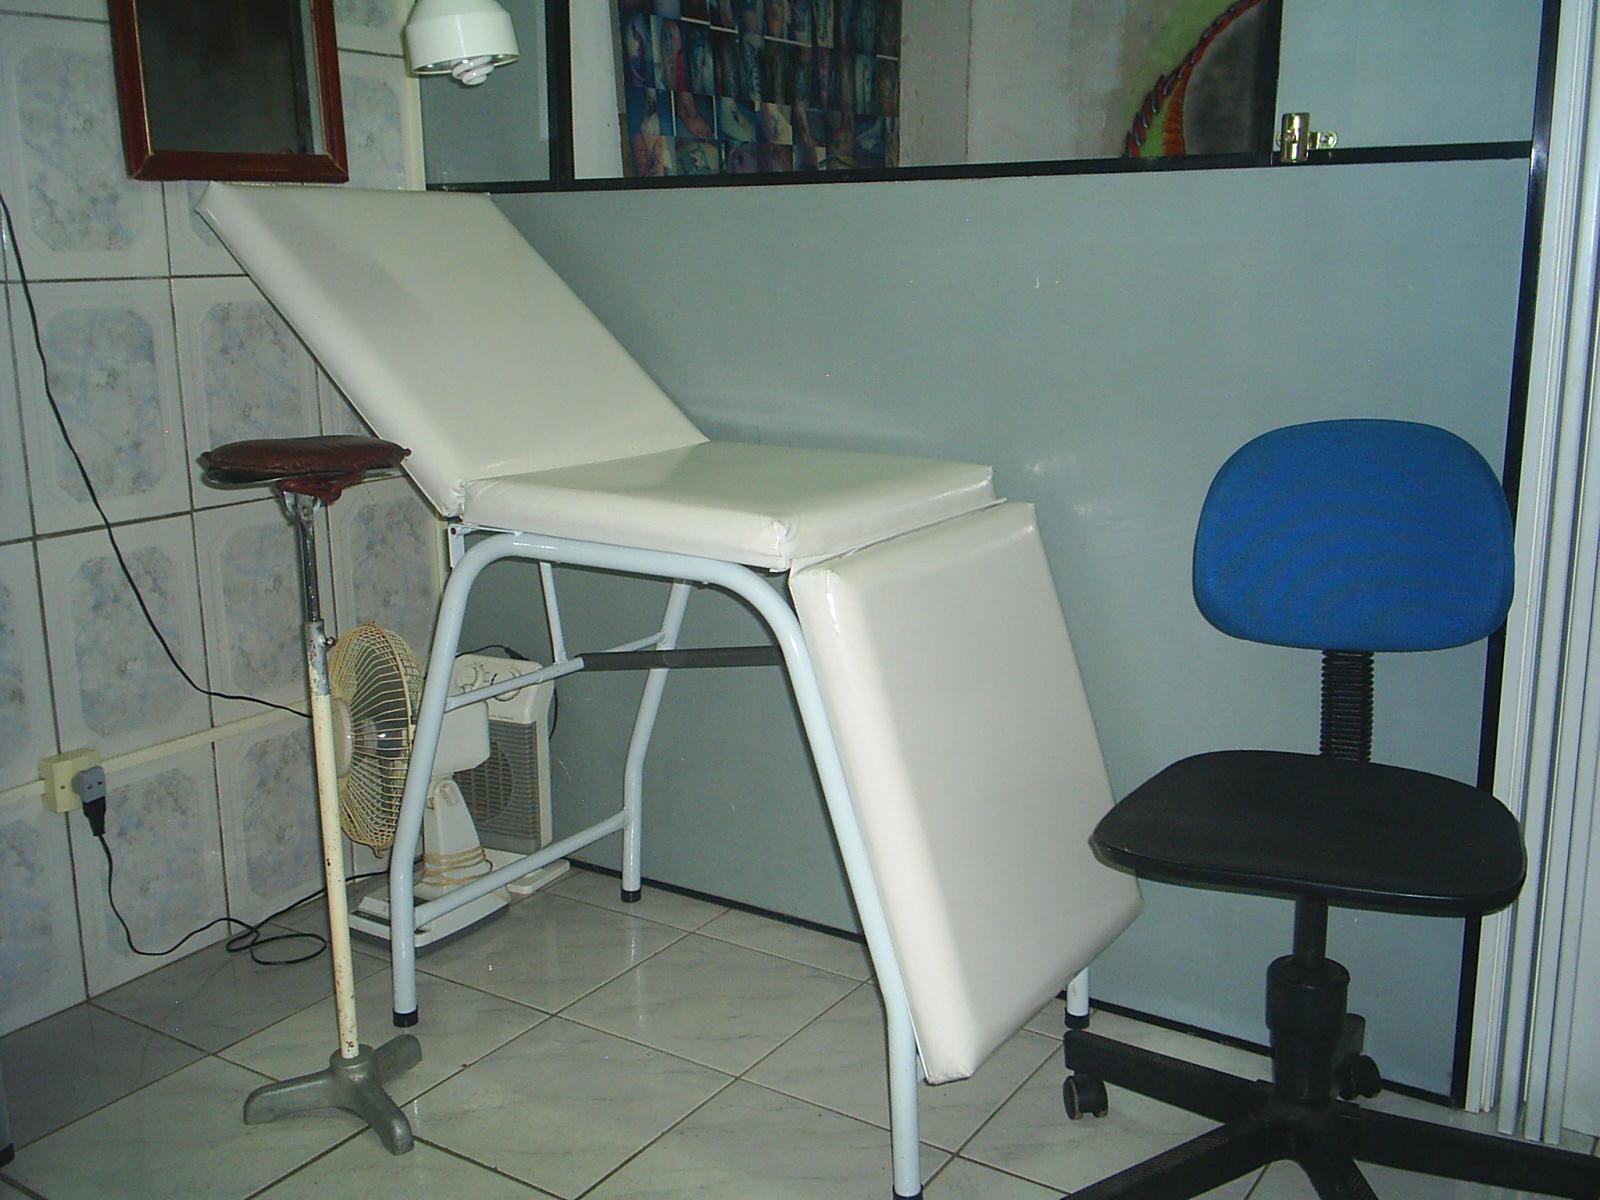 http://3.bp.blogspot.com/-xmsVnxEZzMA/TbJjdZ55oMI/AAAAAAAAAK8/FfzUovvVIhk/s1600/fontitattoo+studio+012.jpg